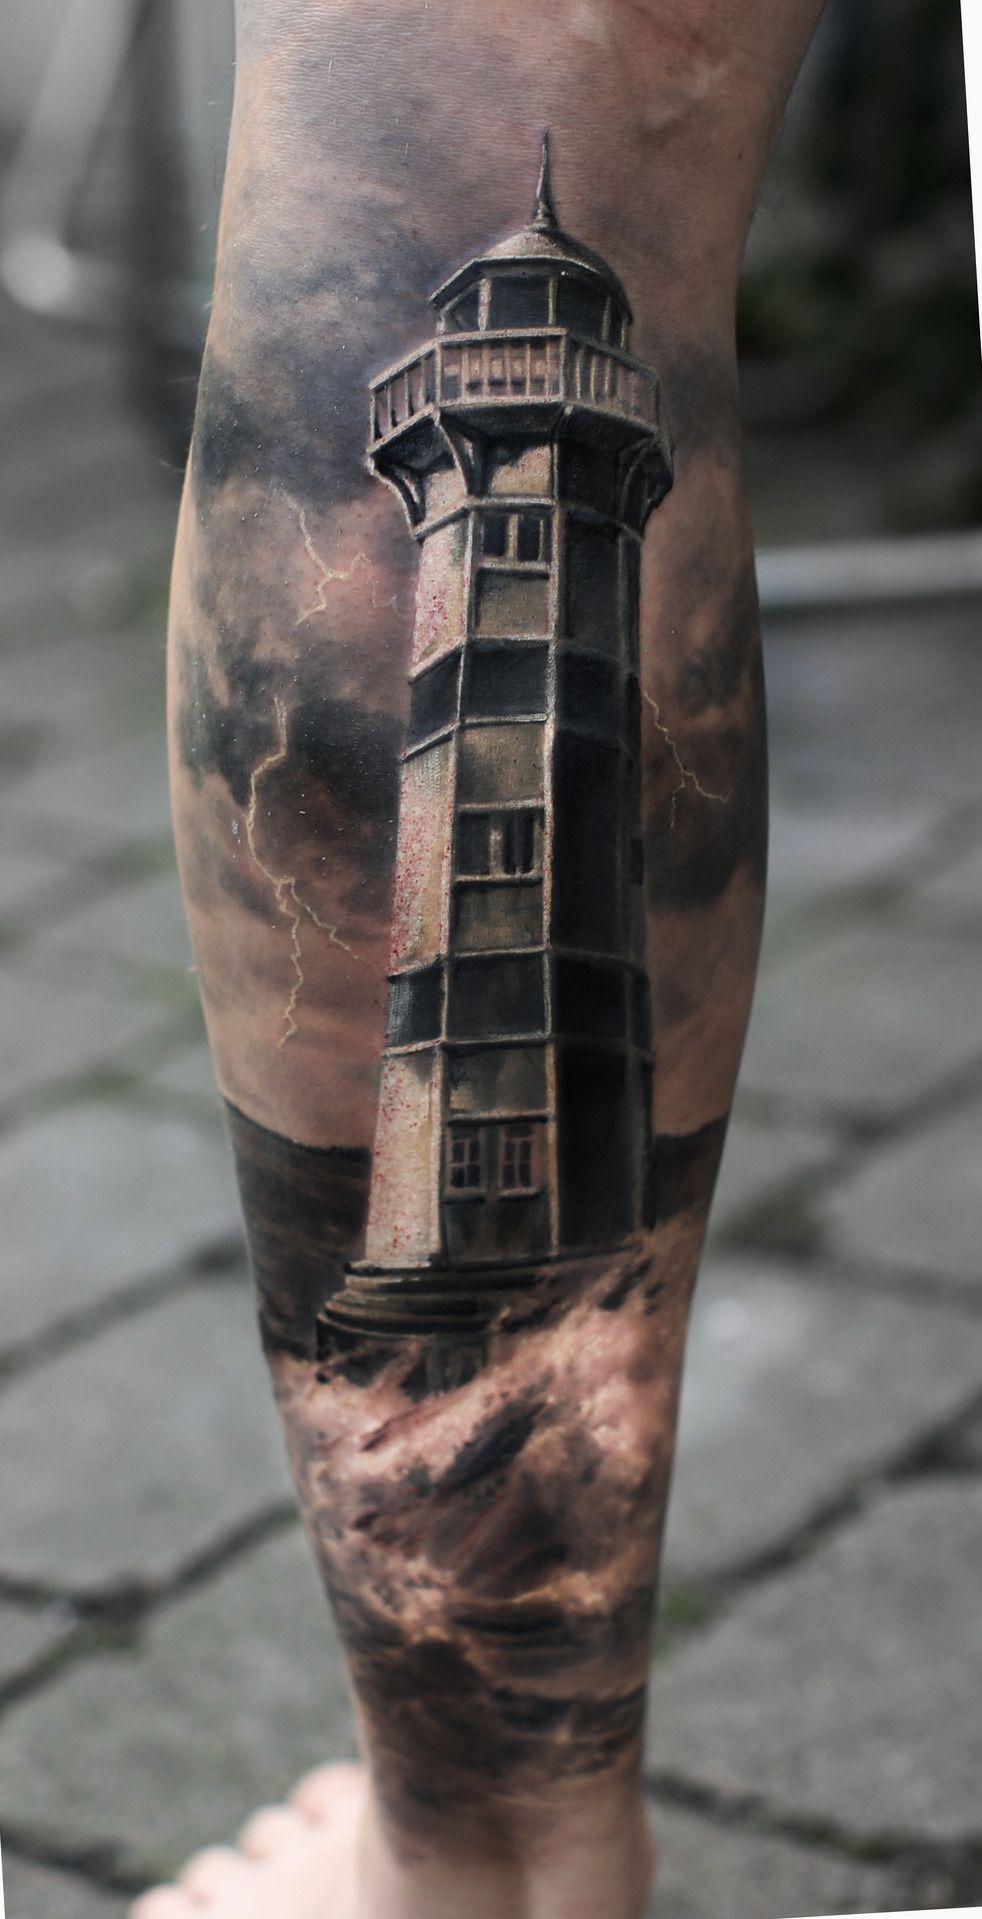 lighthouse tattoo: 24 тыс изображений найдено в Яндекс.Картинках